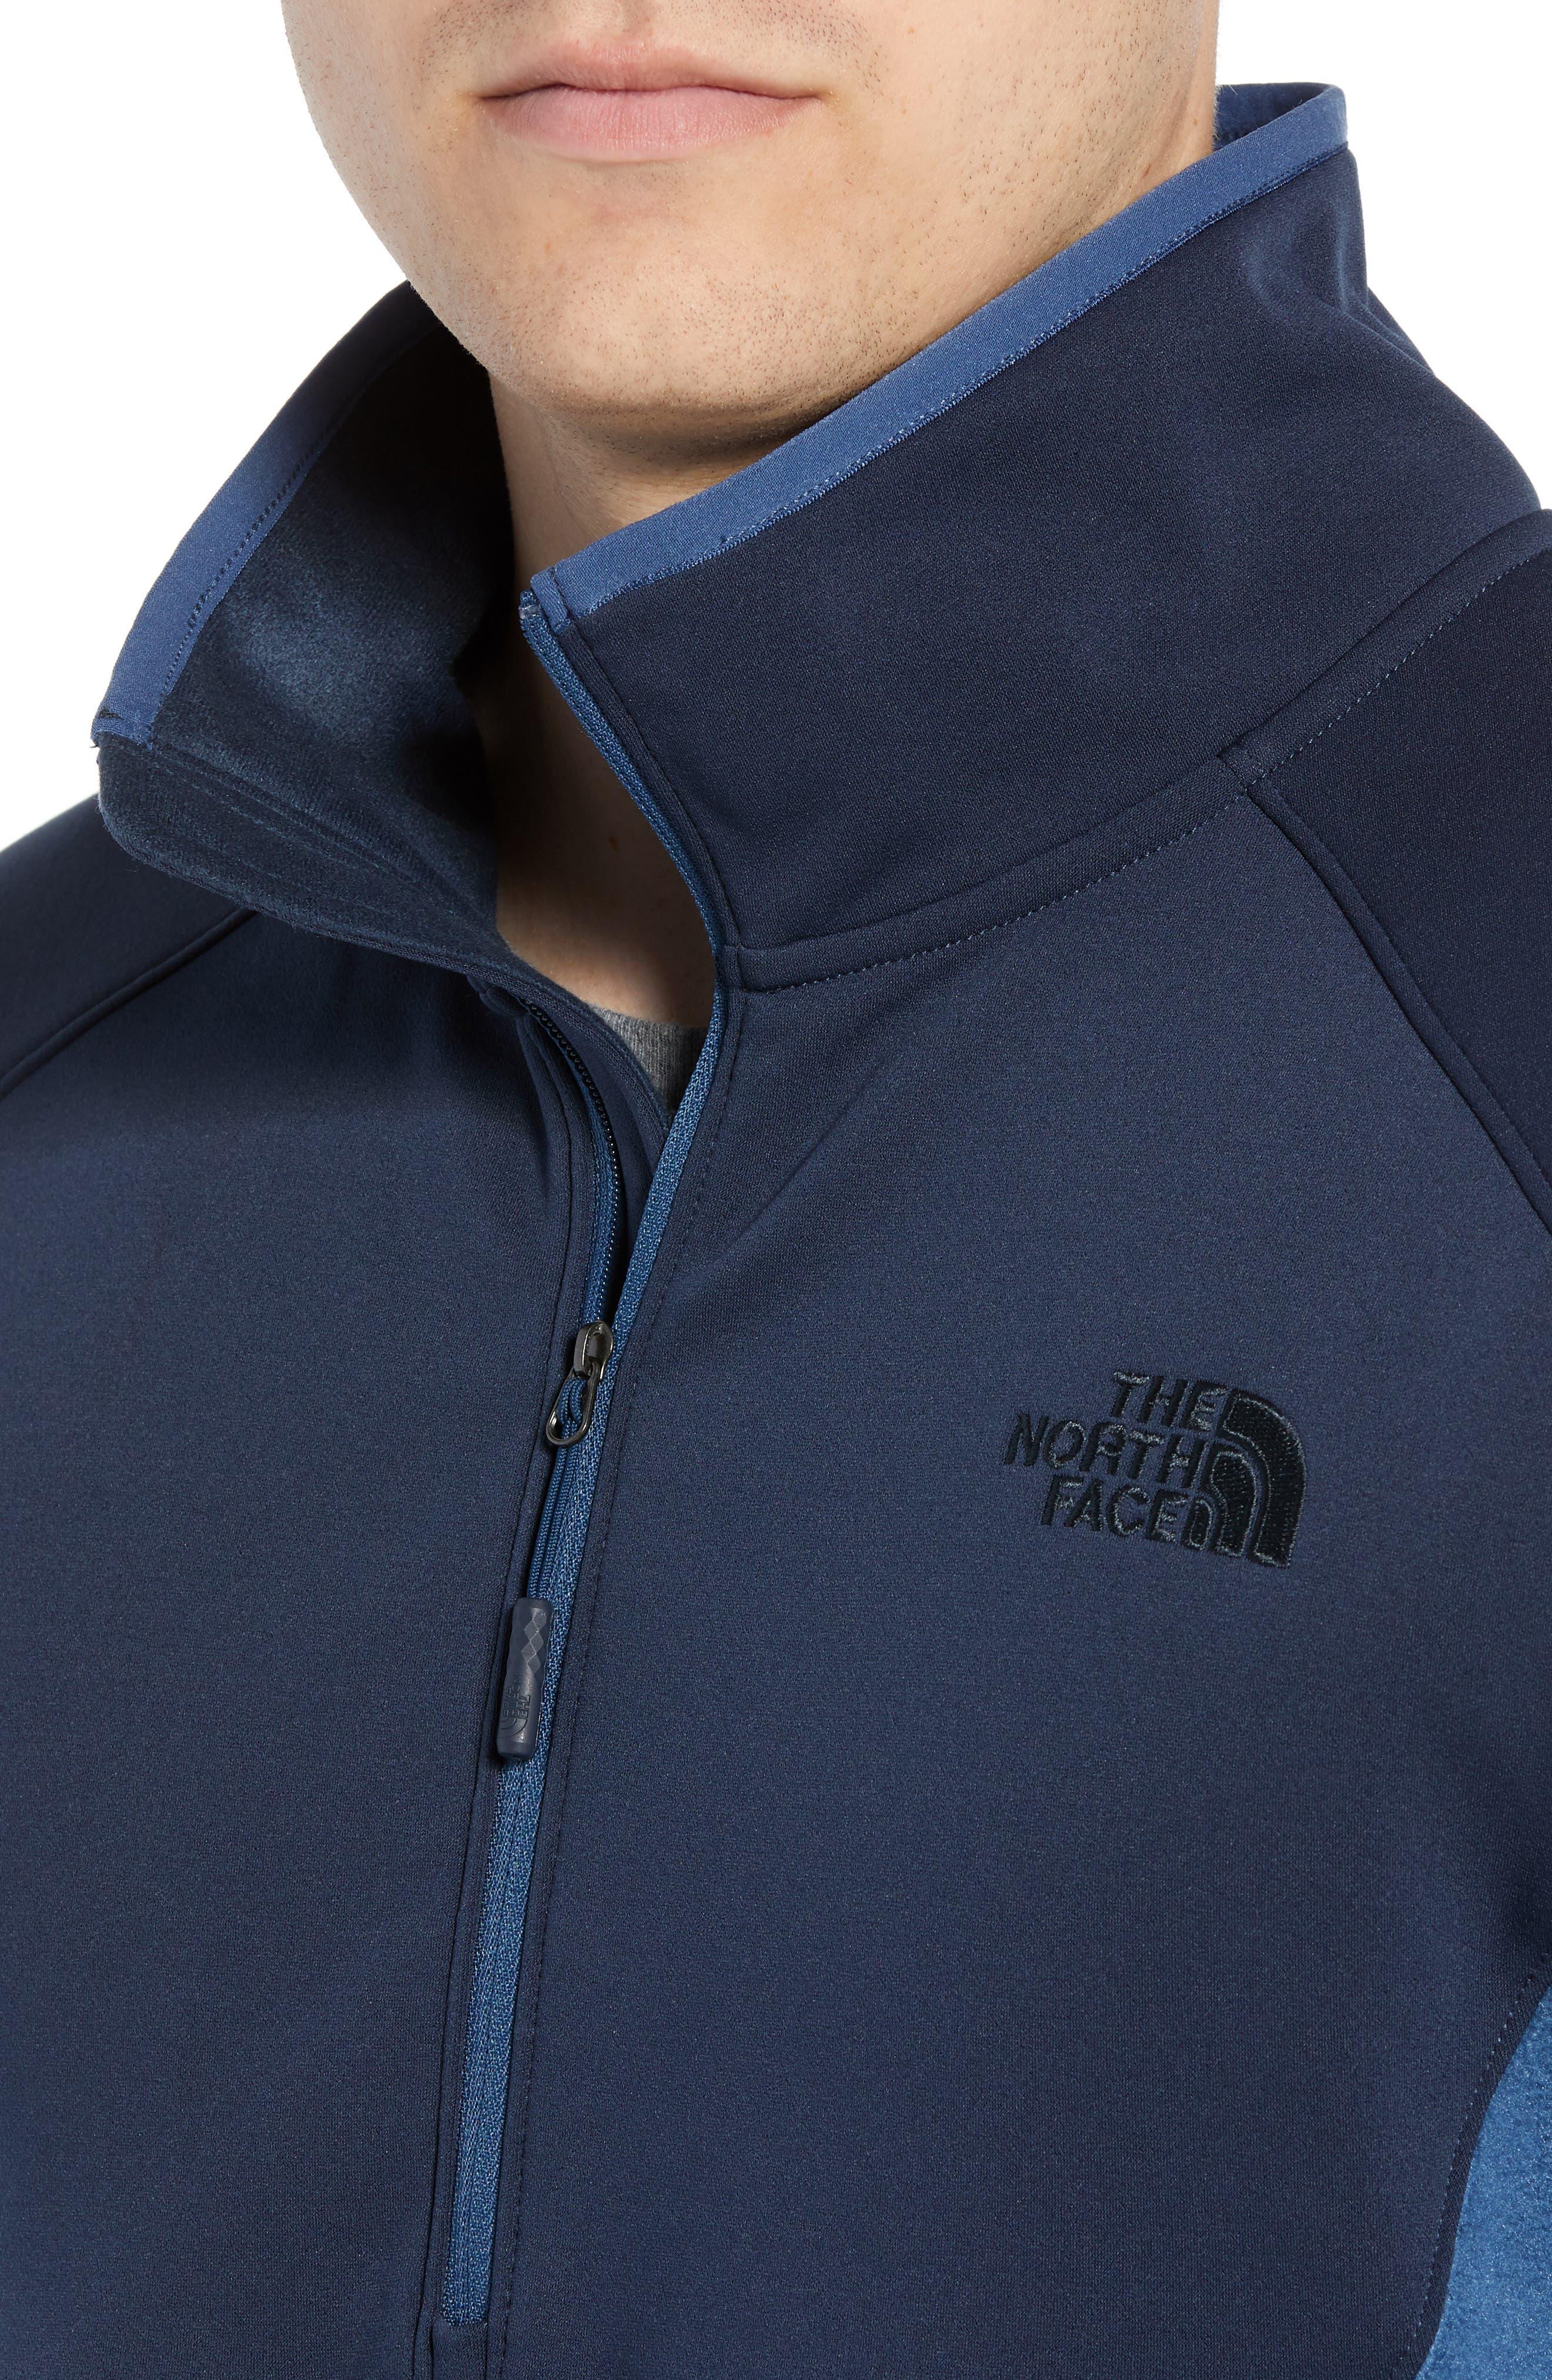 Tolmiepeak Hybrid Half-Zip Pullover,                             Alternate thumbnail 4, color,                             SHADY BLUE/ URBAN NAVY